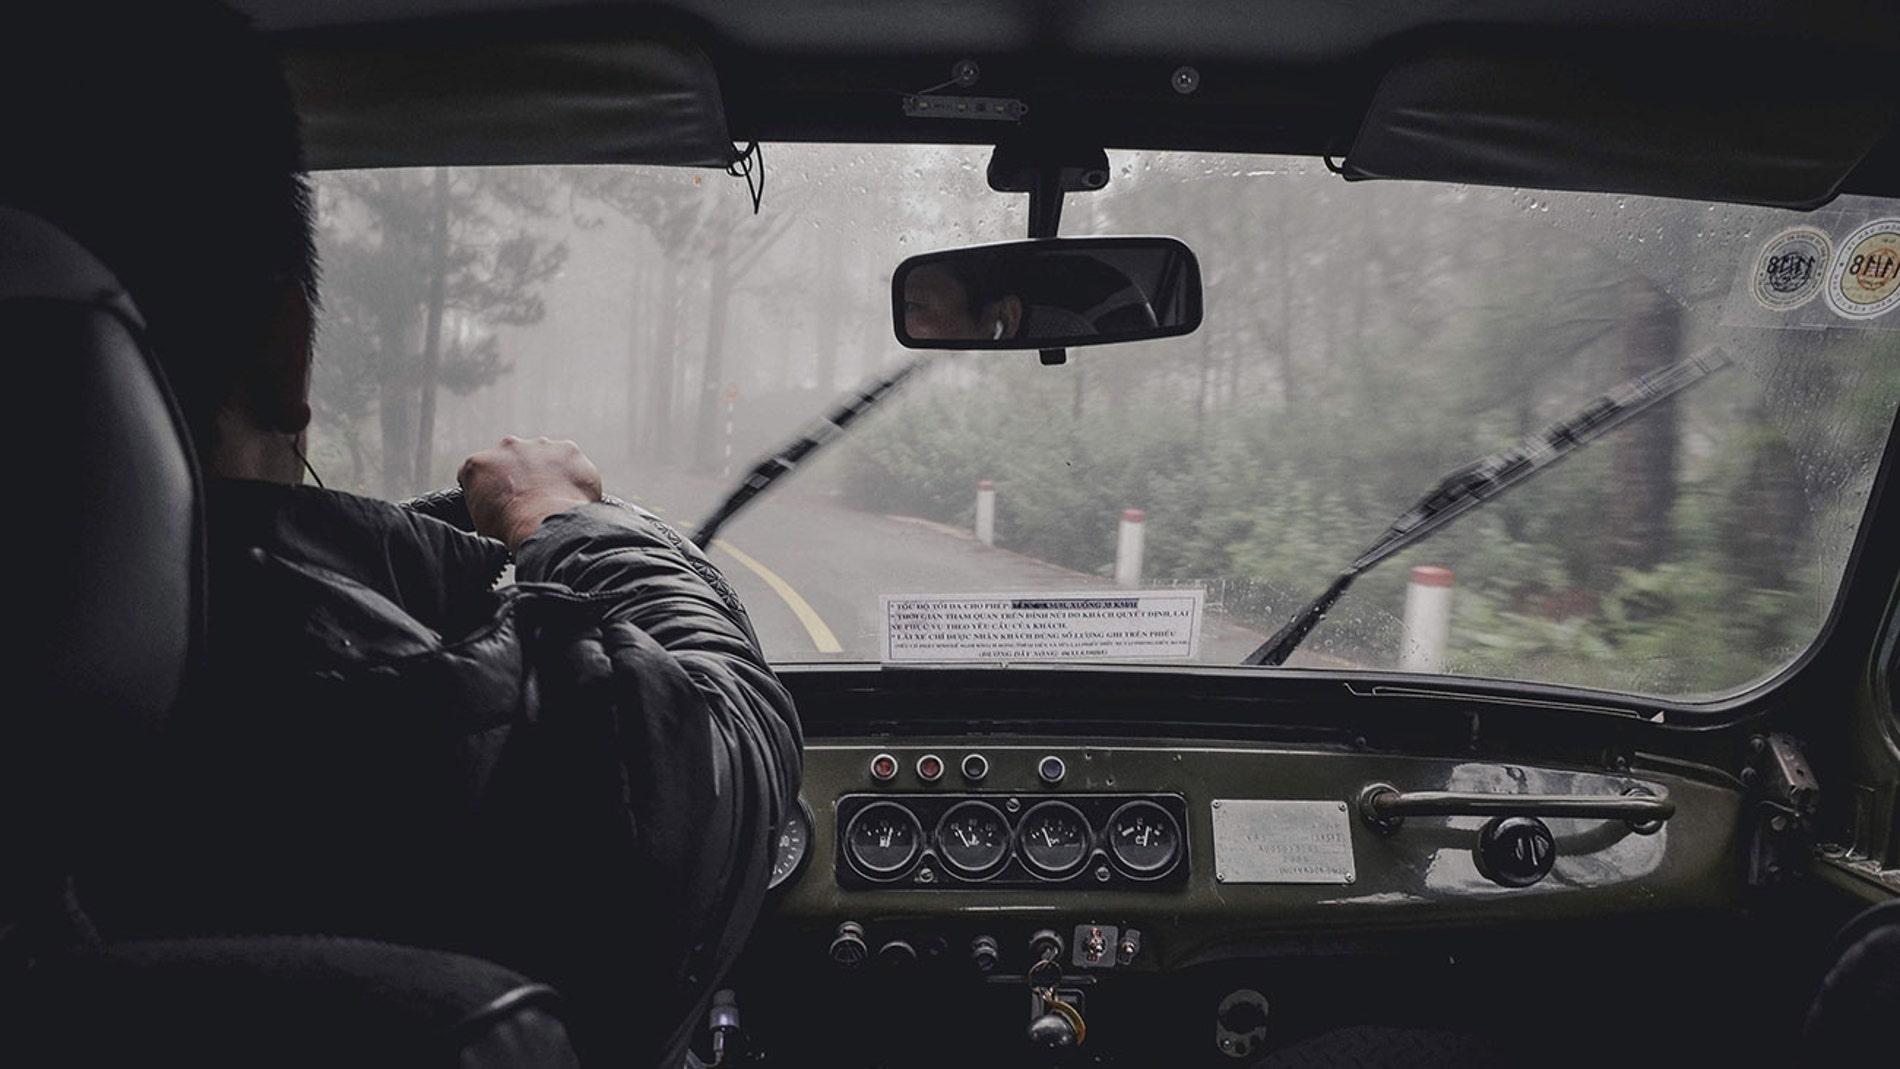 Conductor en furgoneta